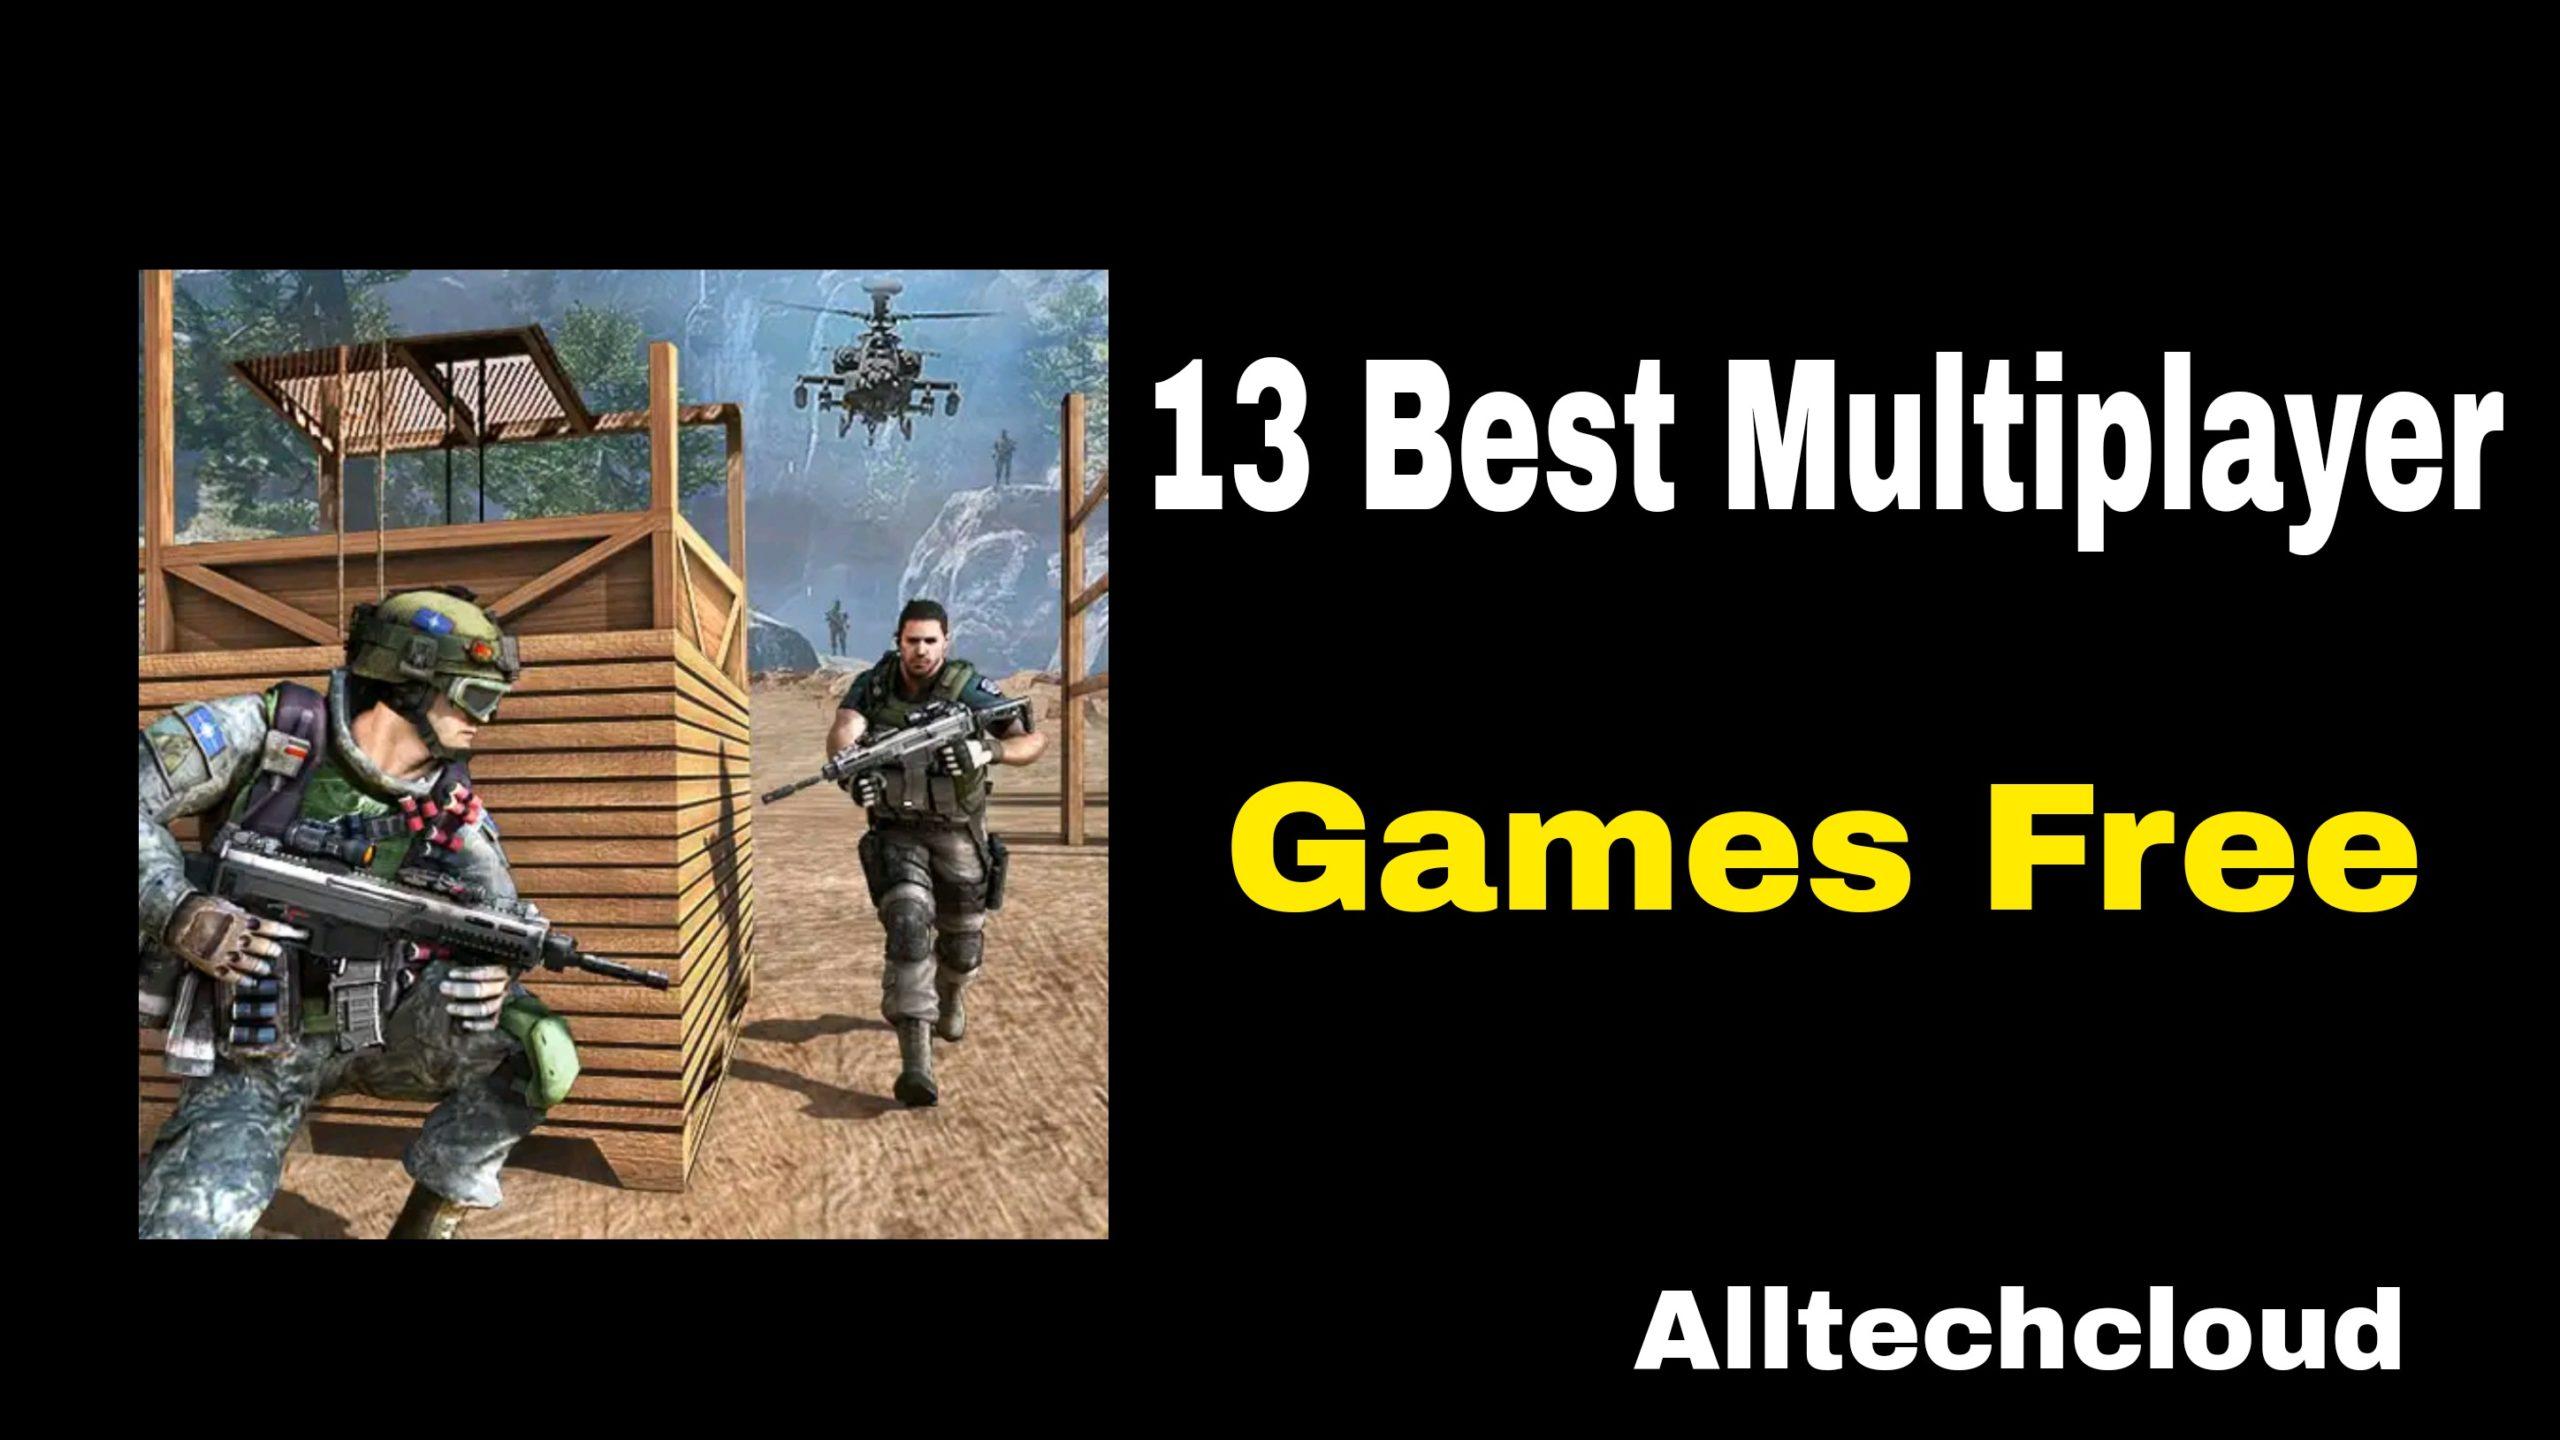 13 Best Multiplayer Games Free Download November 2021